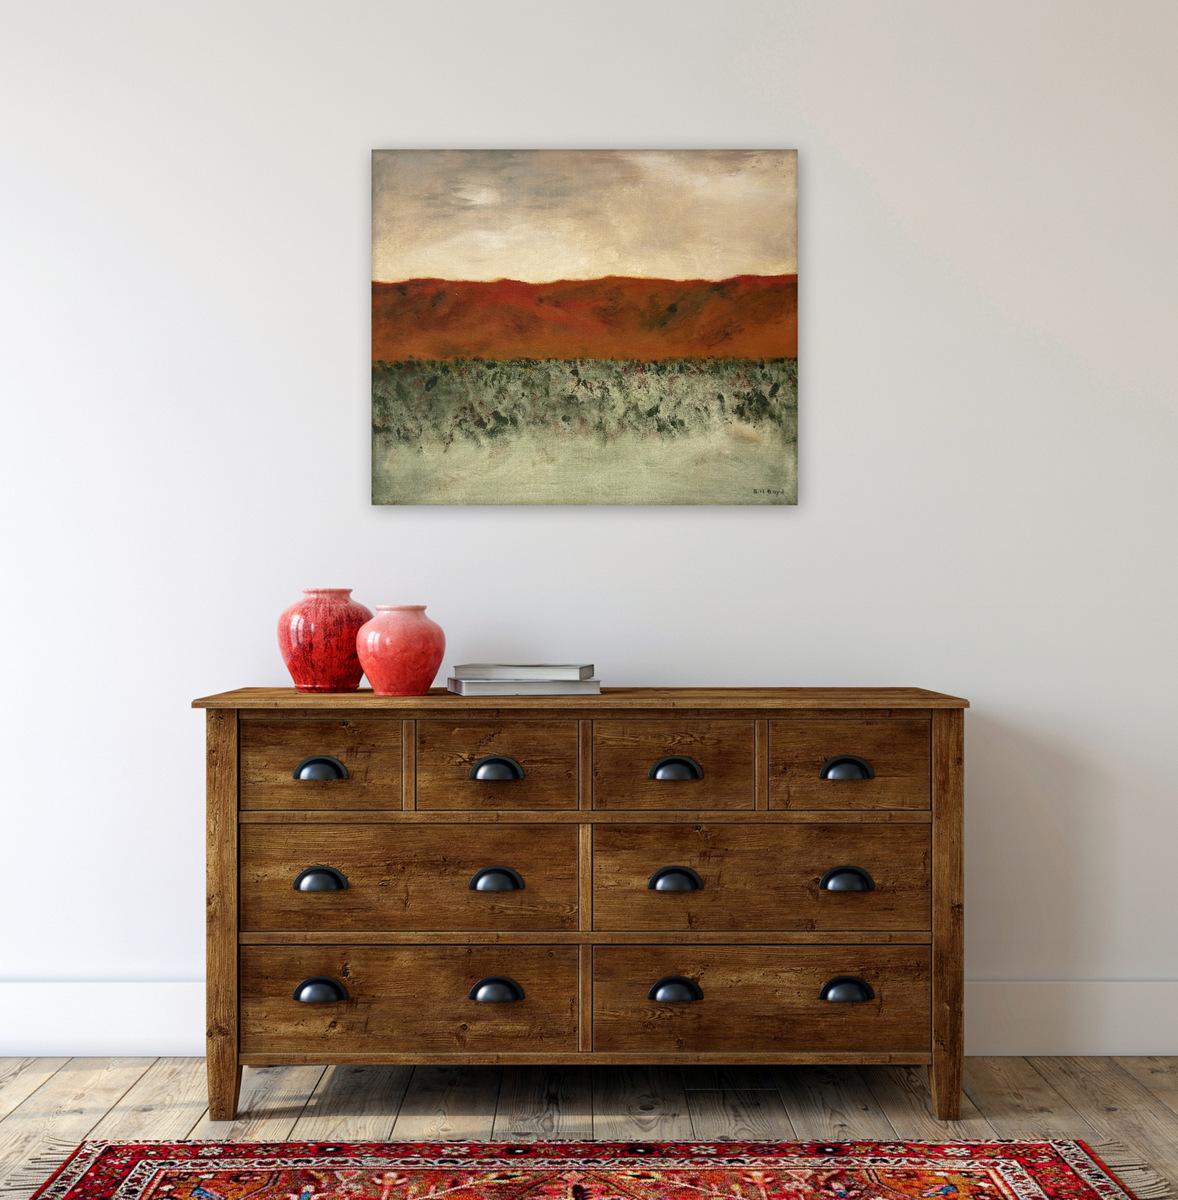 1-Abstract Painting, Bill Boyd, Contemporary Art.jpg